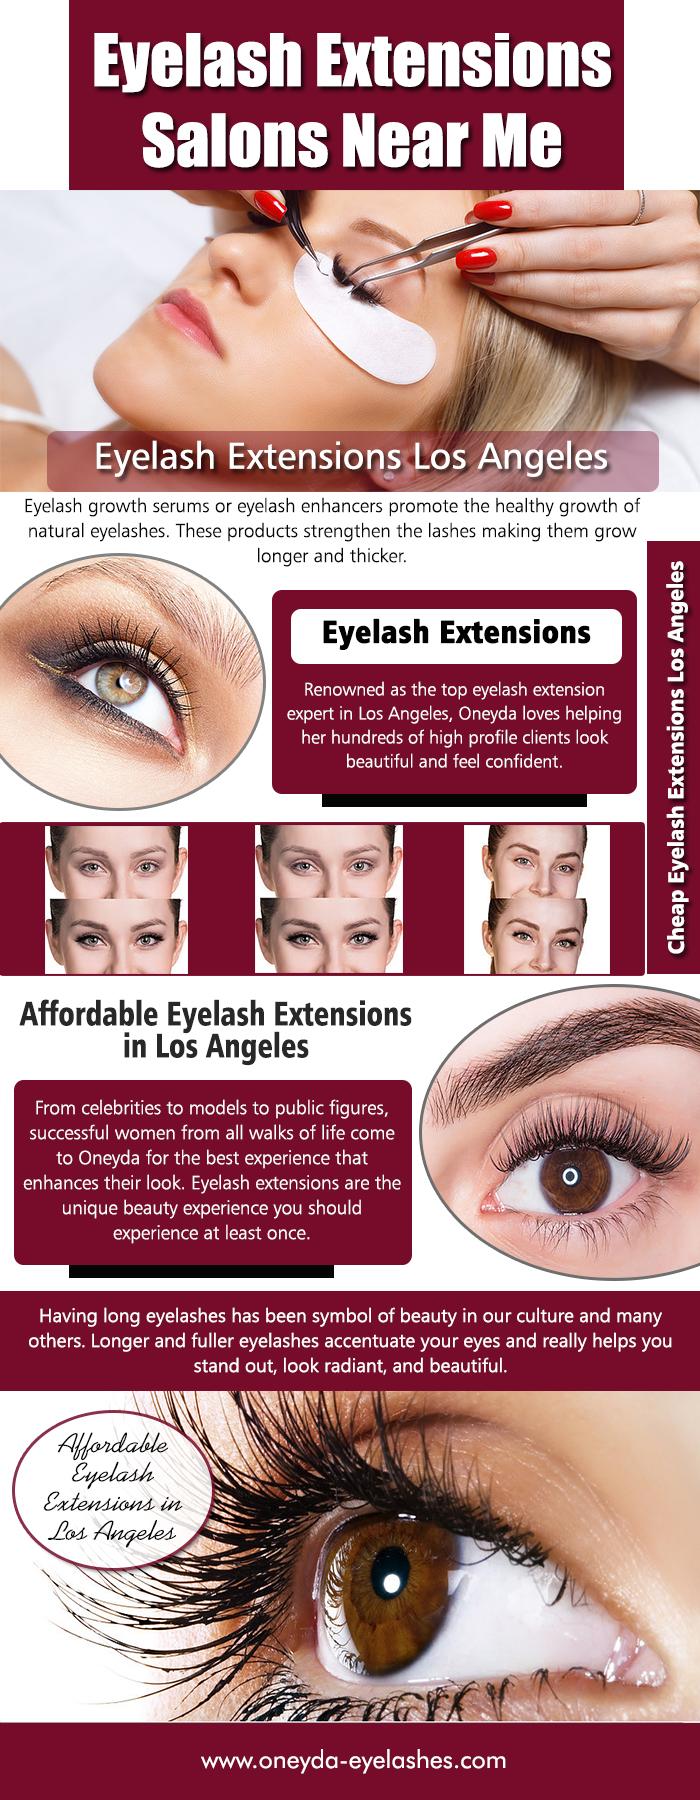 Eyelash Extensions Salons Near Me